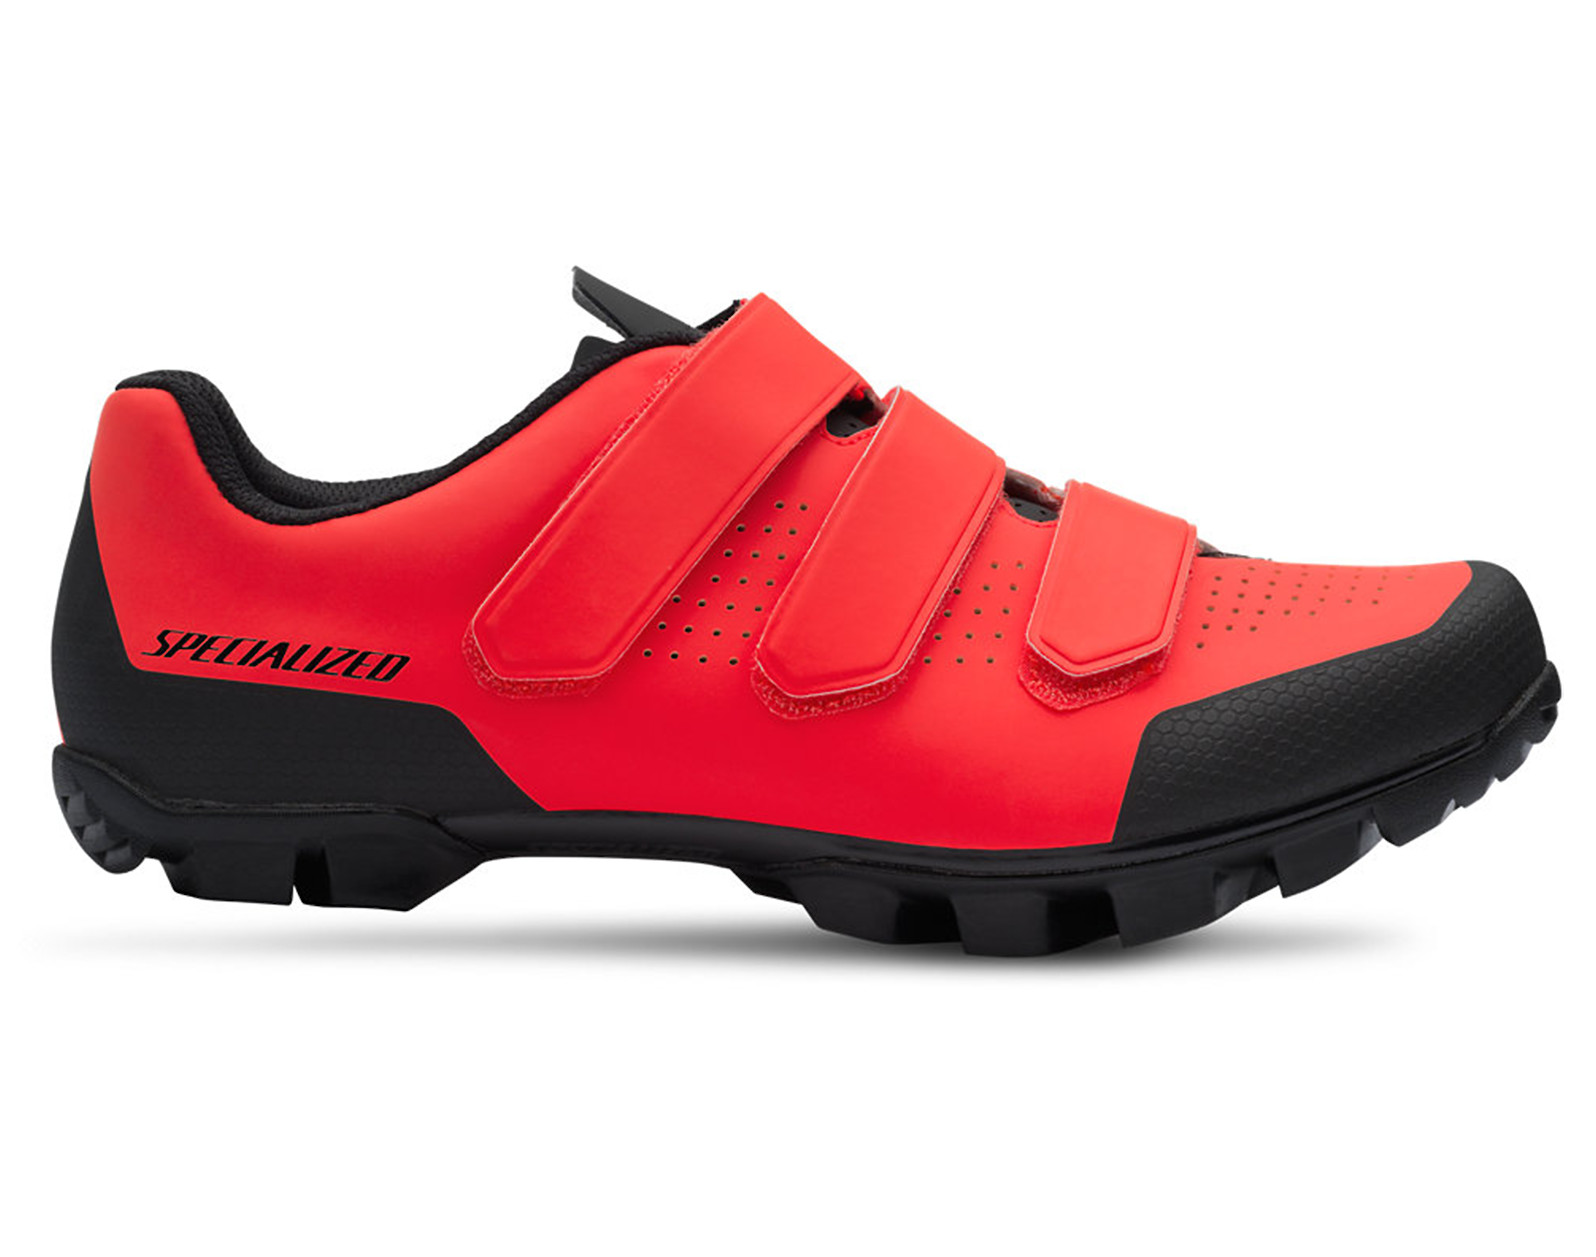 Specialized Sport Clipless Shoe (Rocket Red)